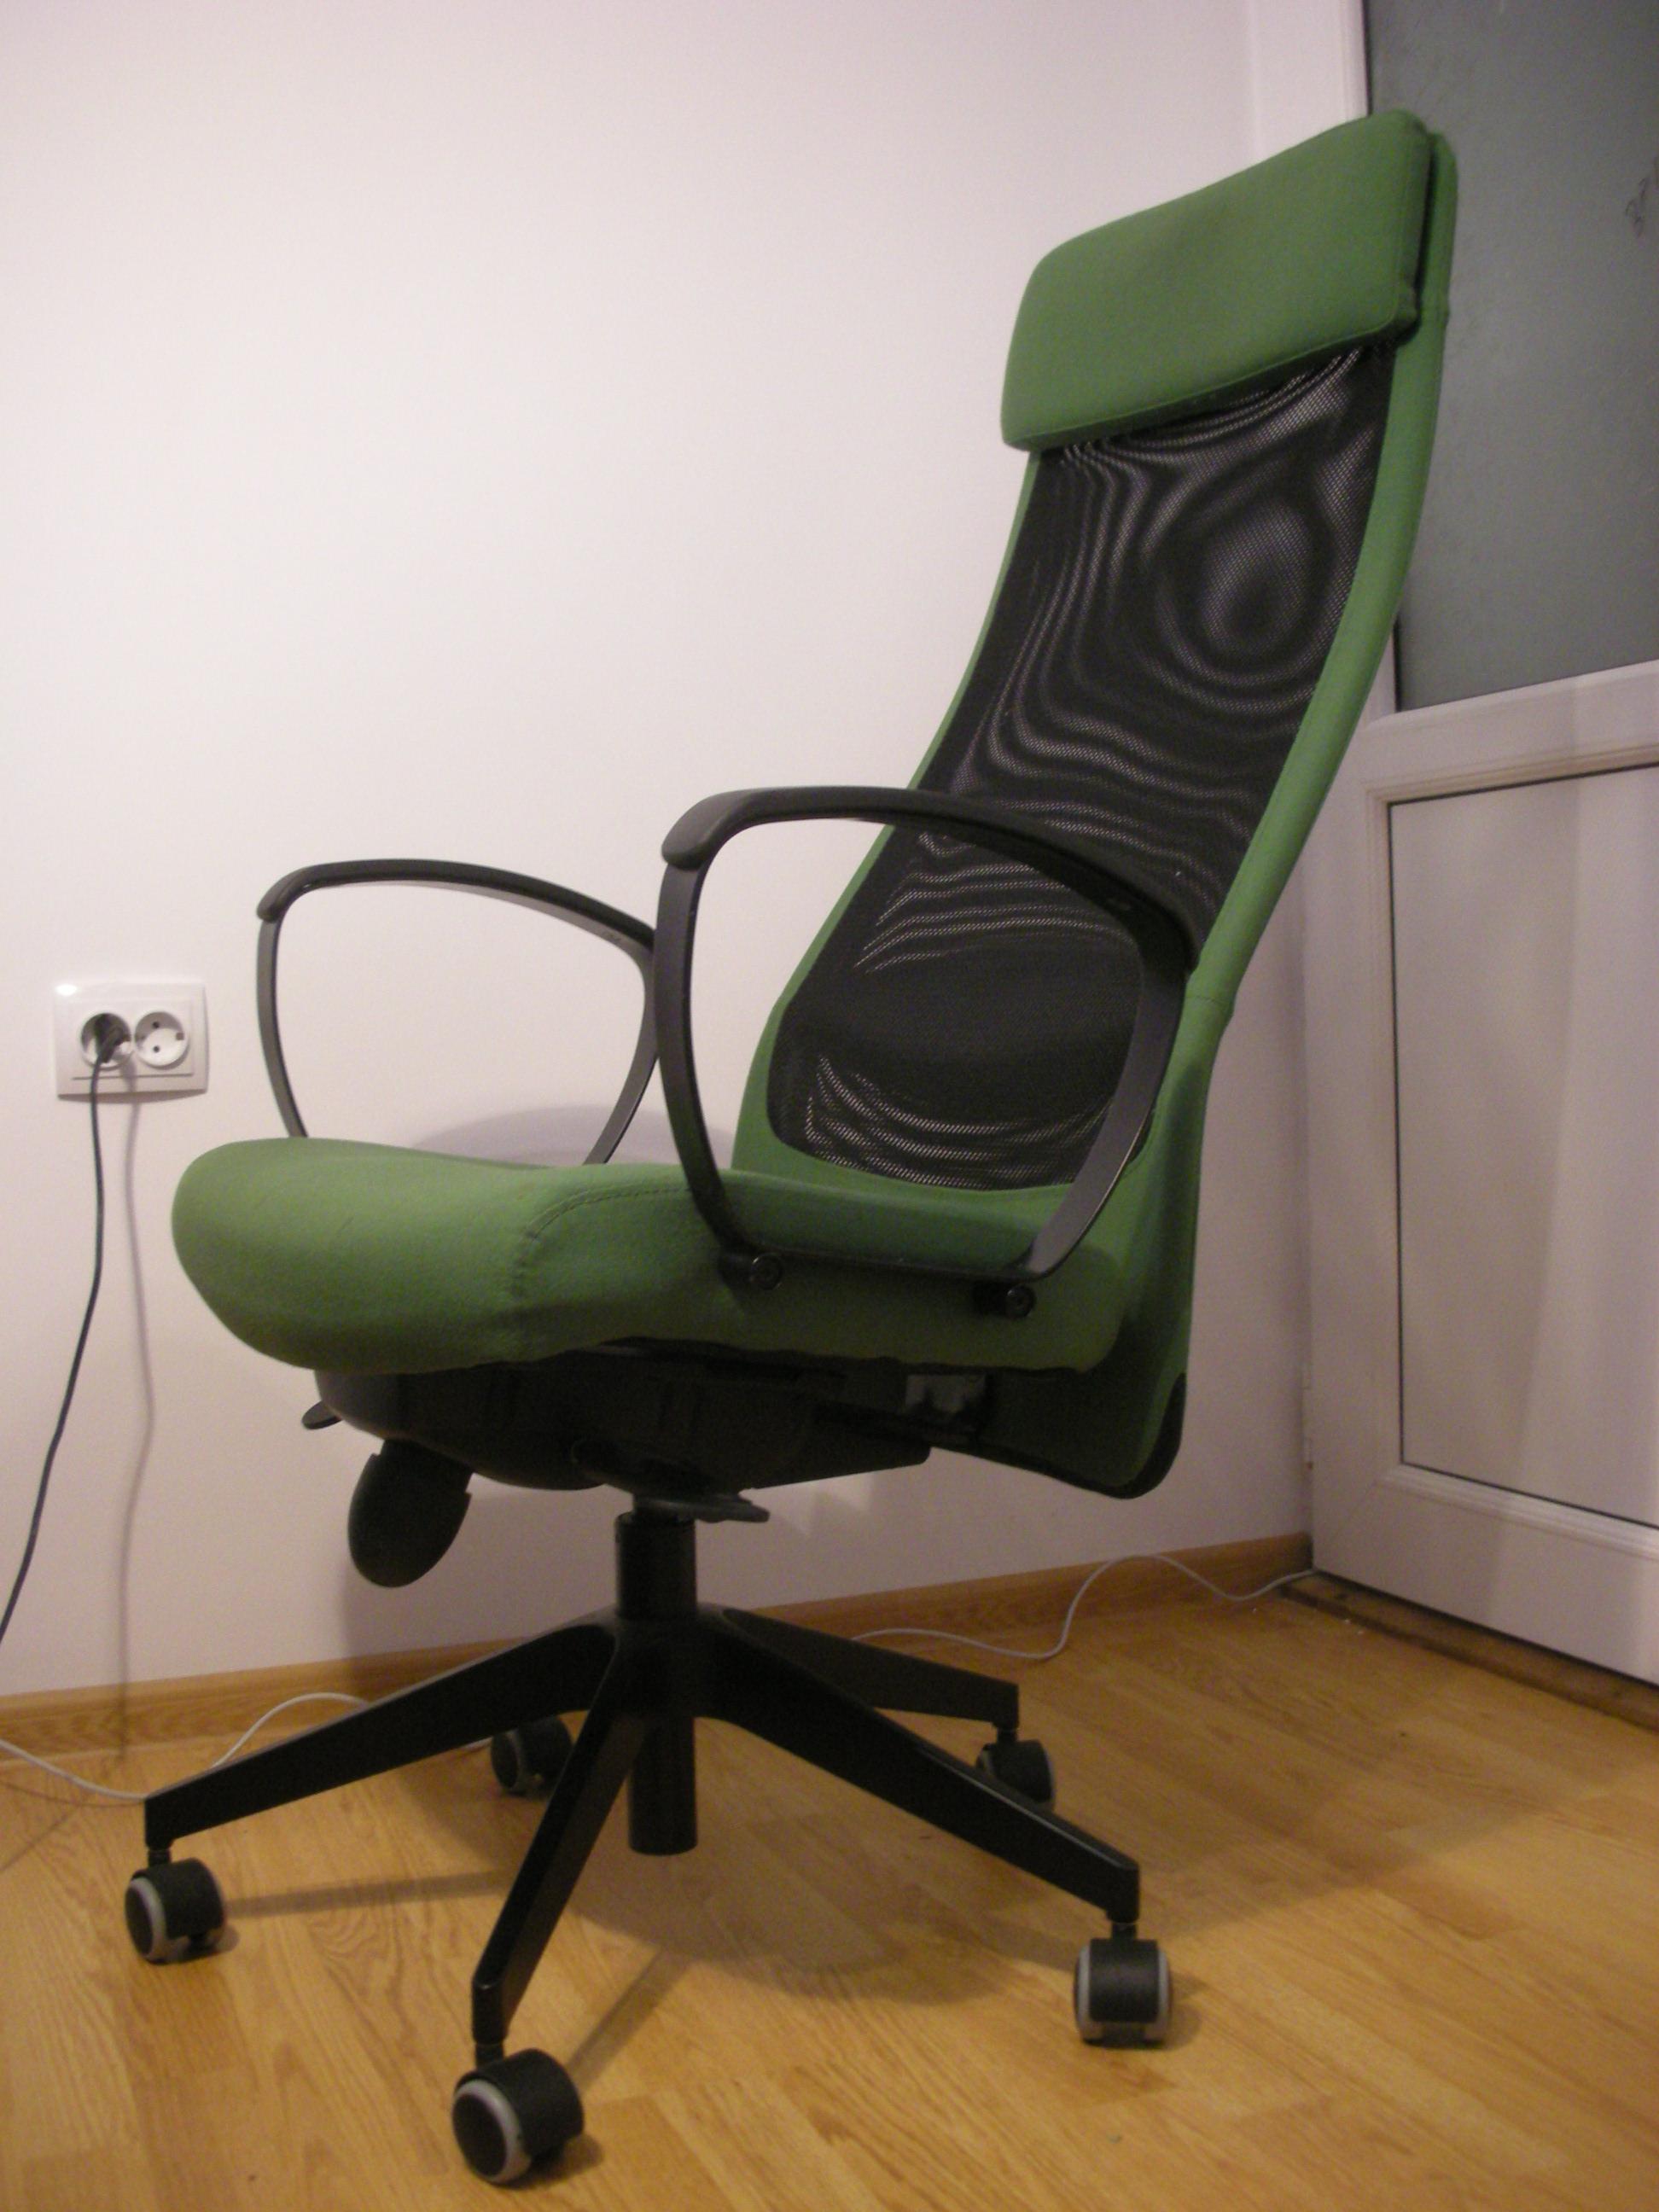 ikea drehstuhl markus garantie. Black Bedroom Furniture Sets. Home Design Ideas